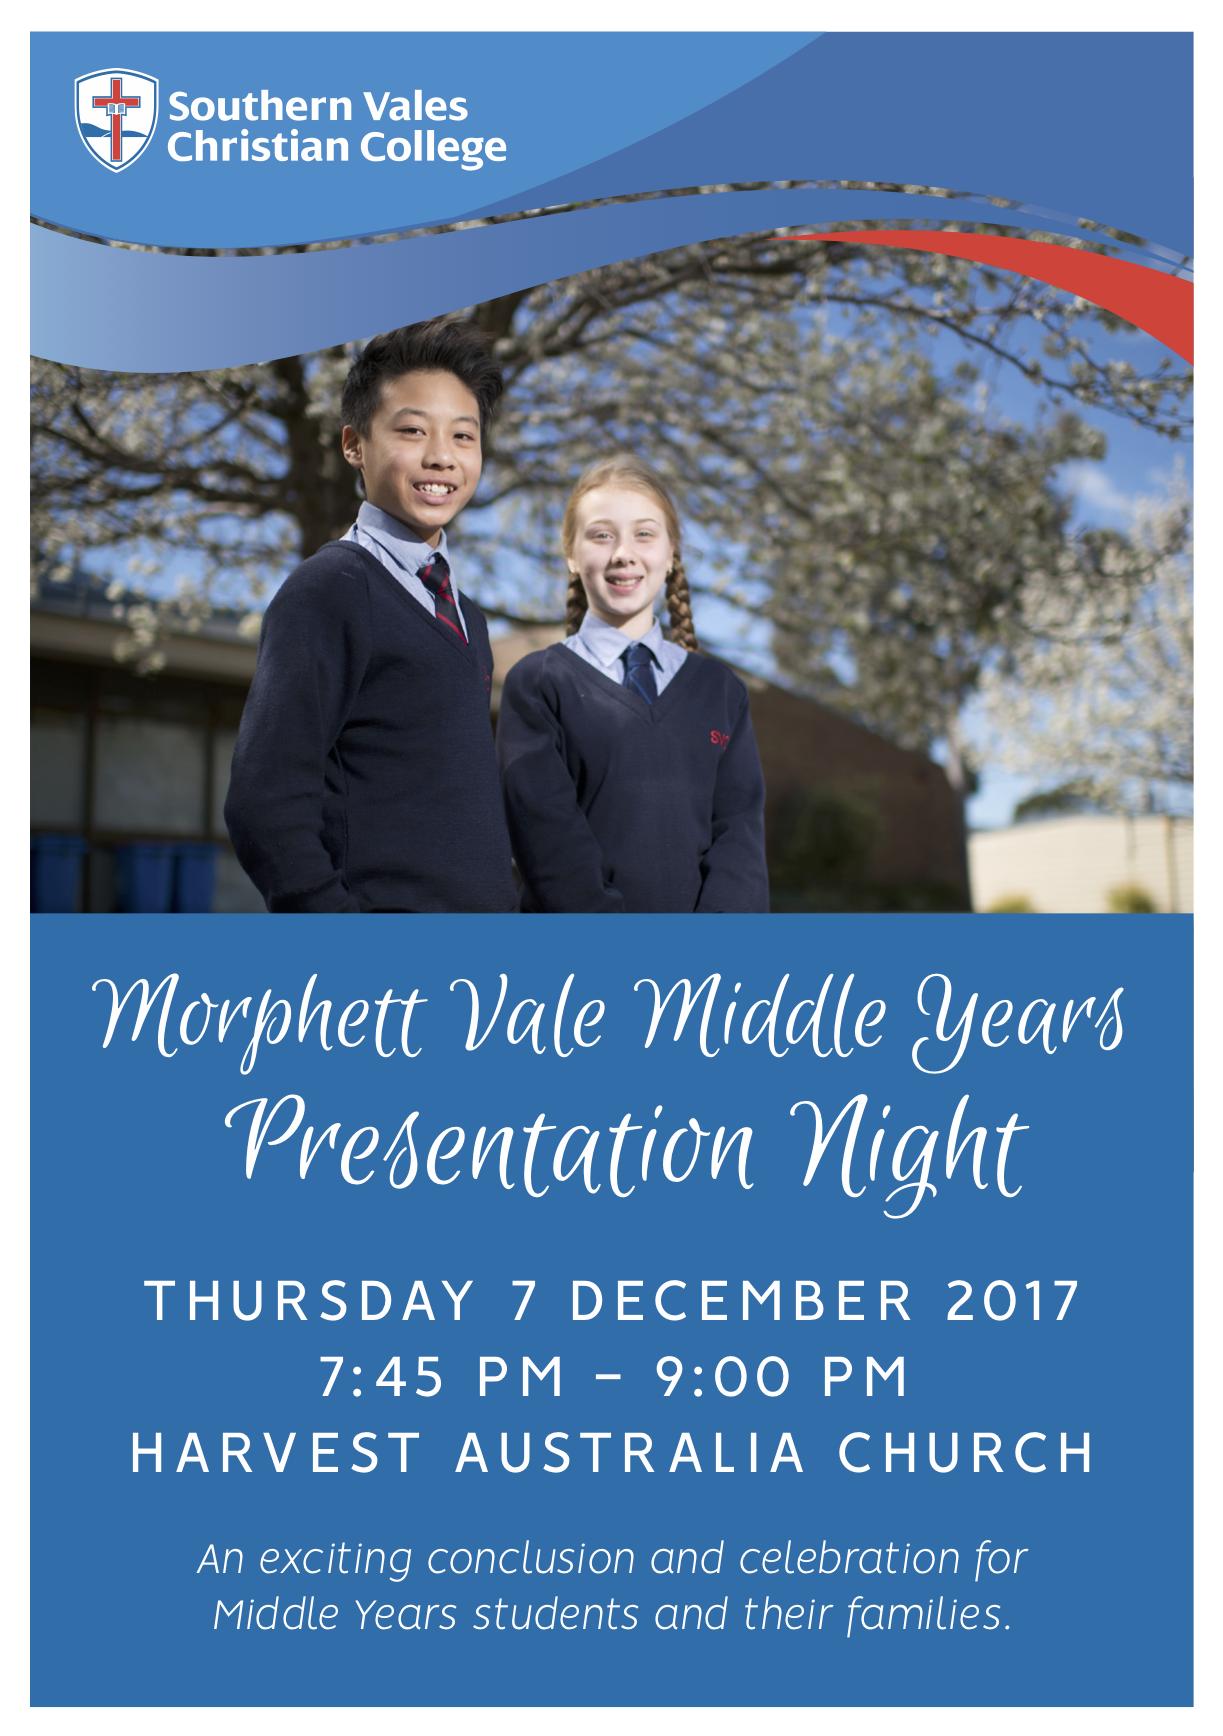 Middle Years Presentation Night Invitation MV.png